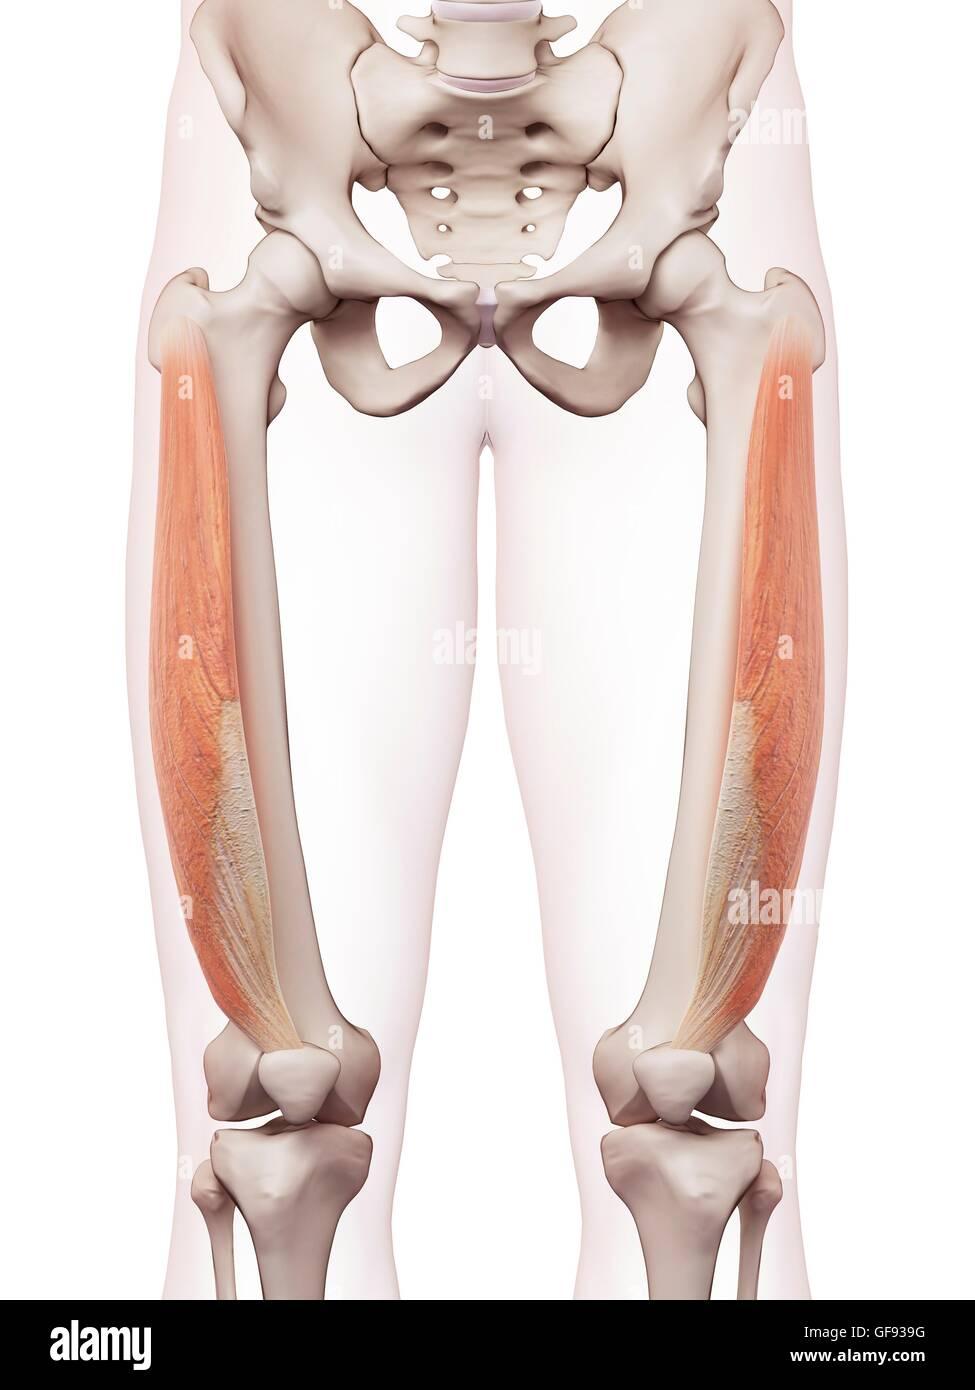 Human leg muscles, illustration Stock Photo: 112682236 - Alamy